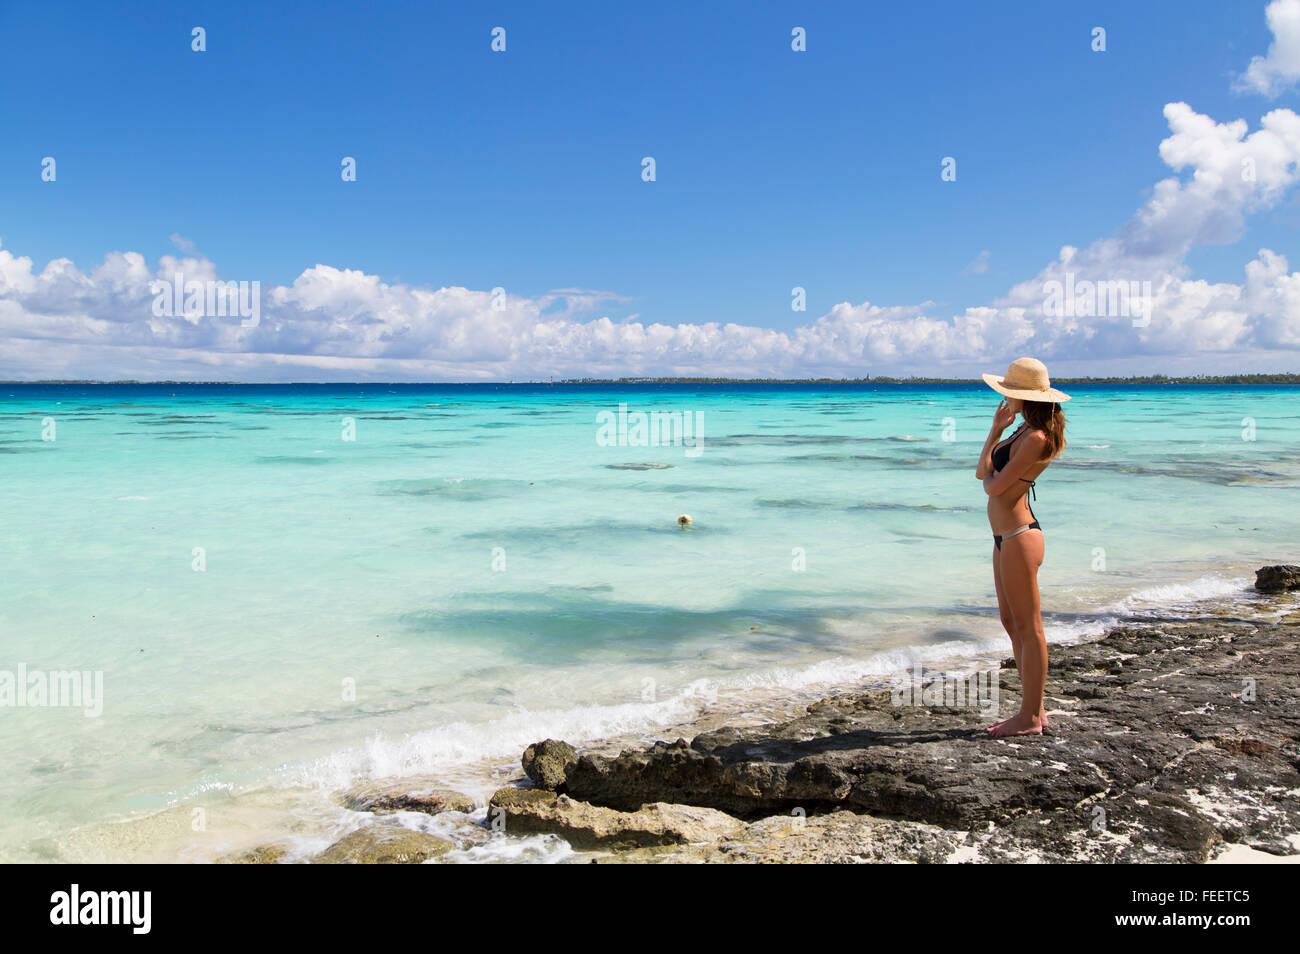 Woman on beach, Fakarava, Tuamotu Islands, French Polynesia - Stock Image